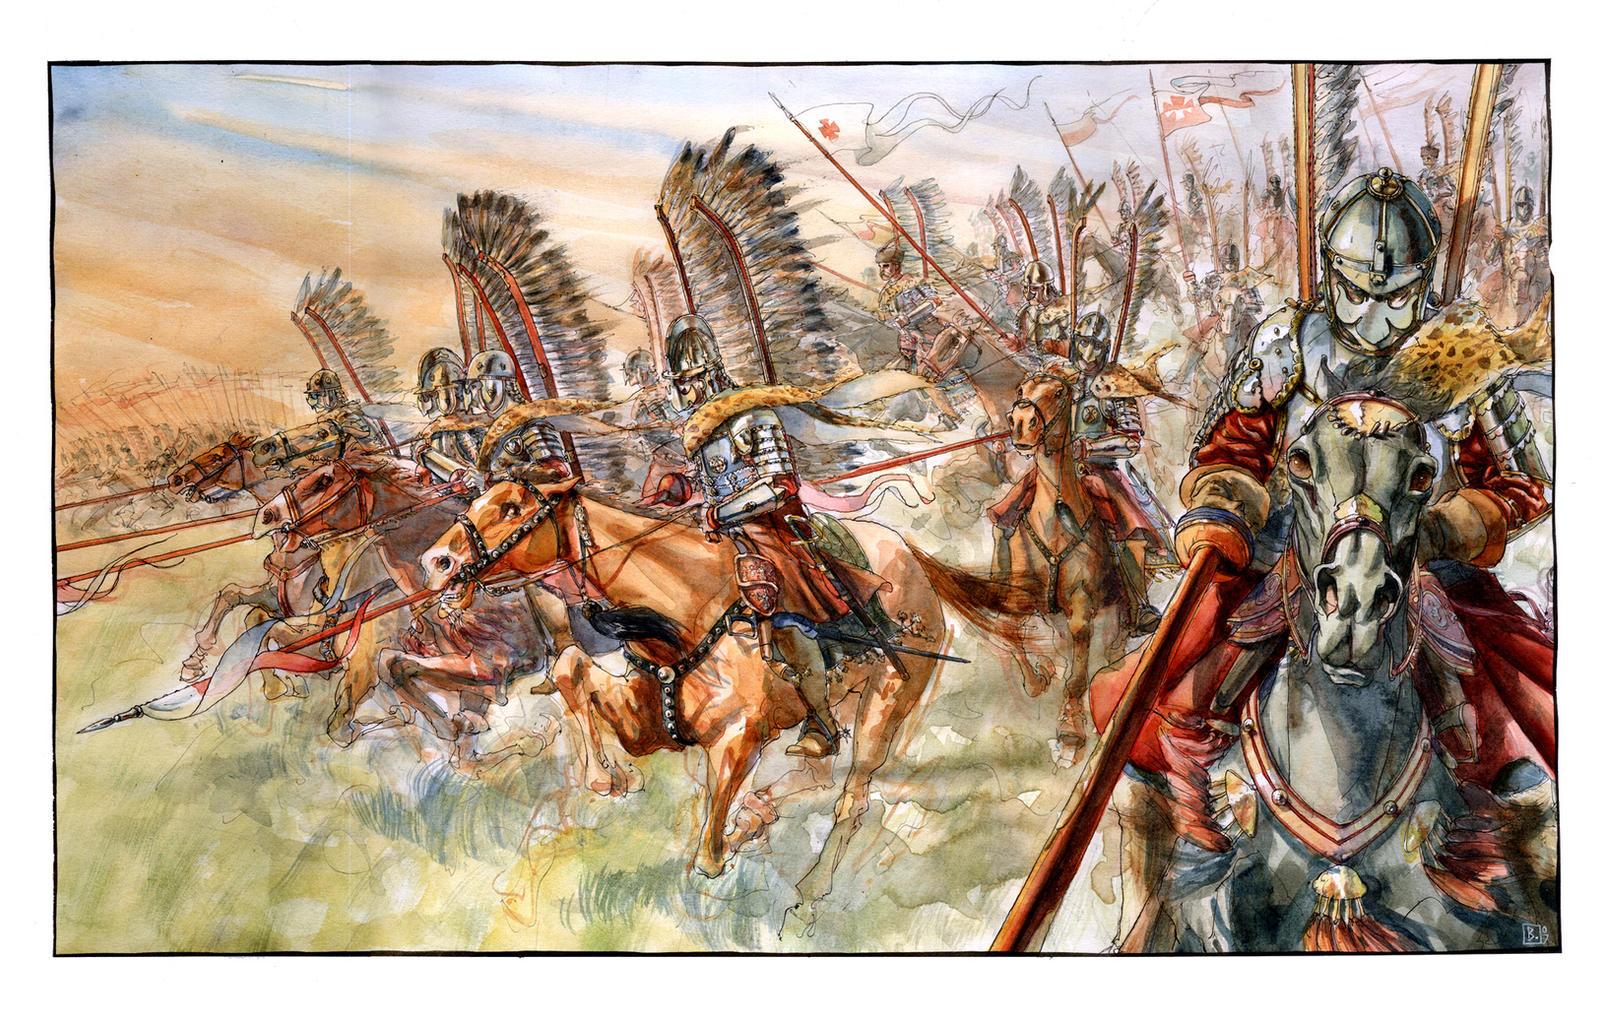 The Winged Horsemen